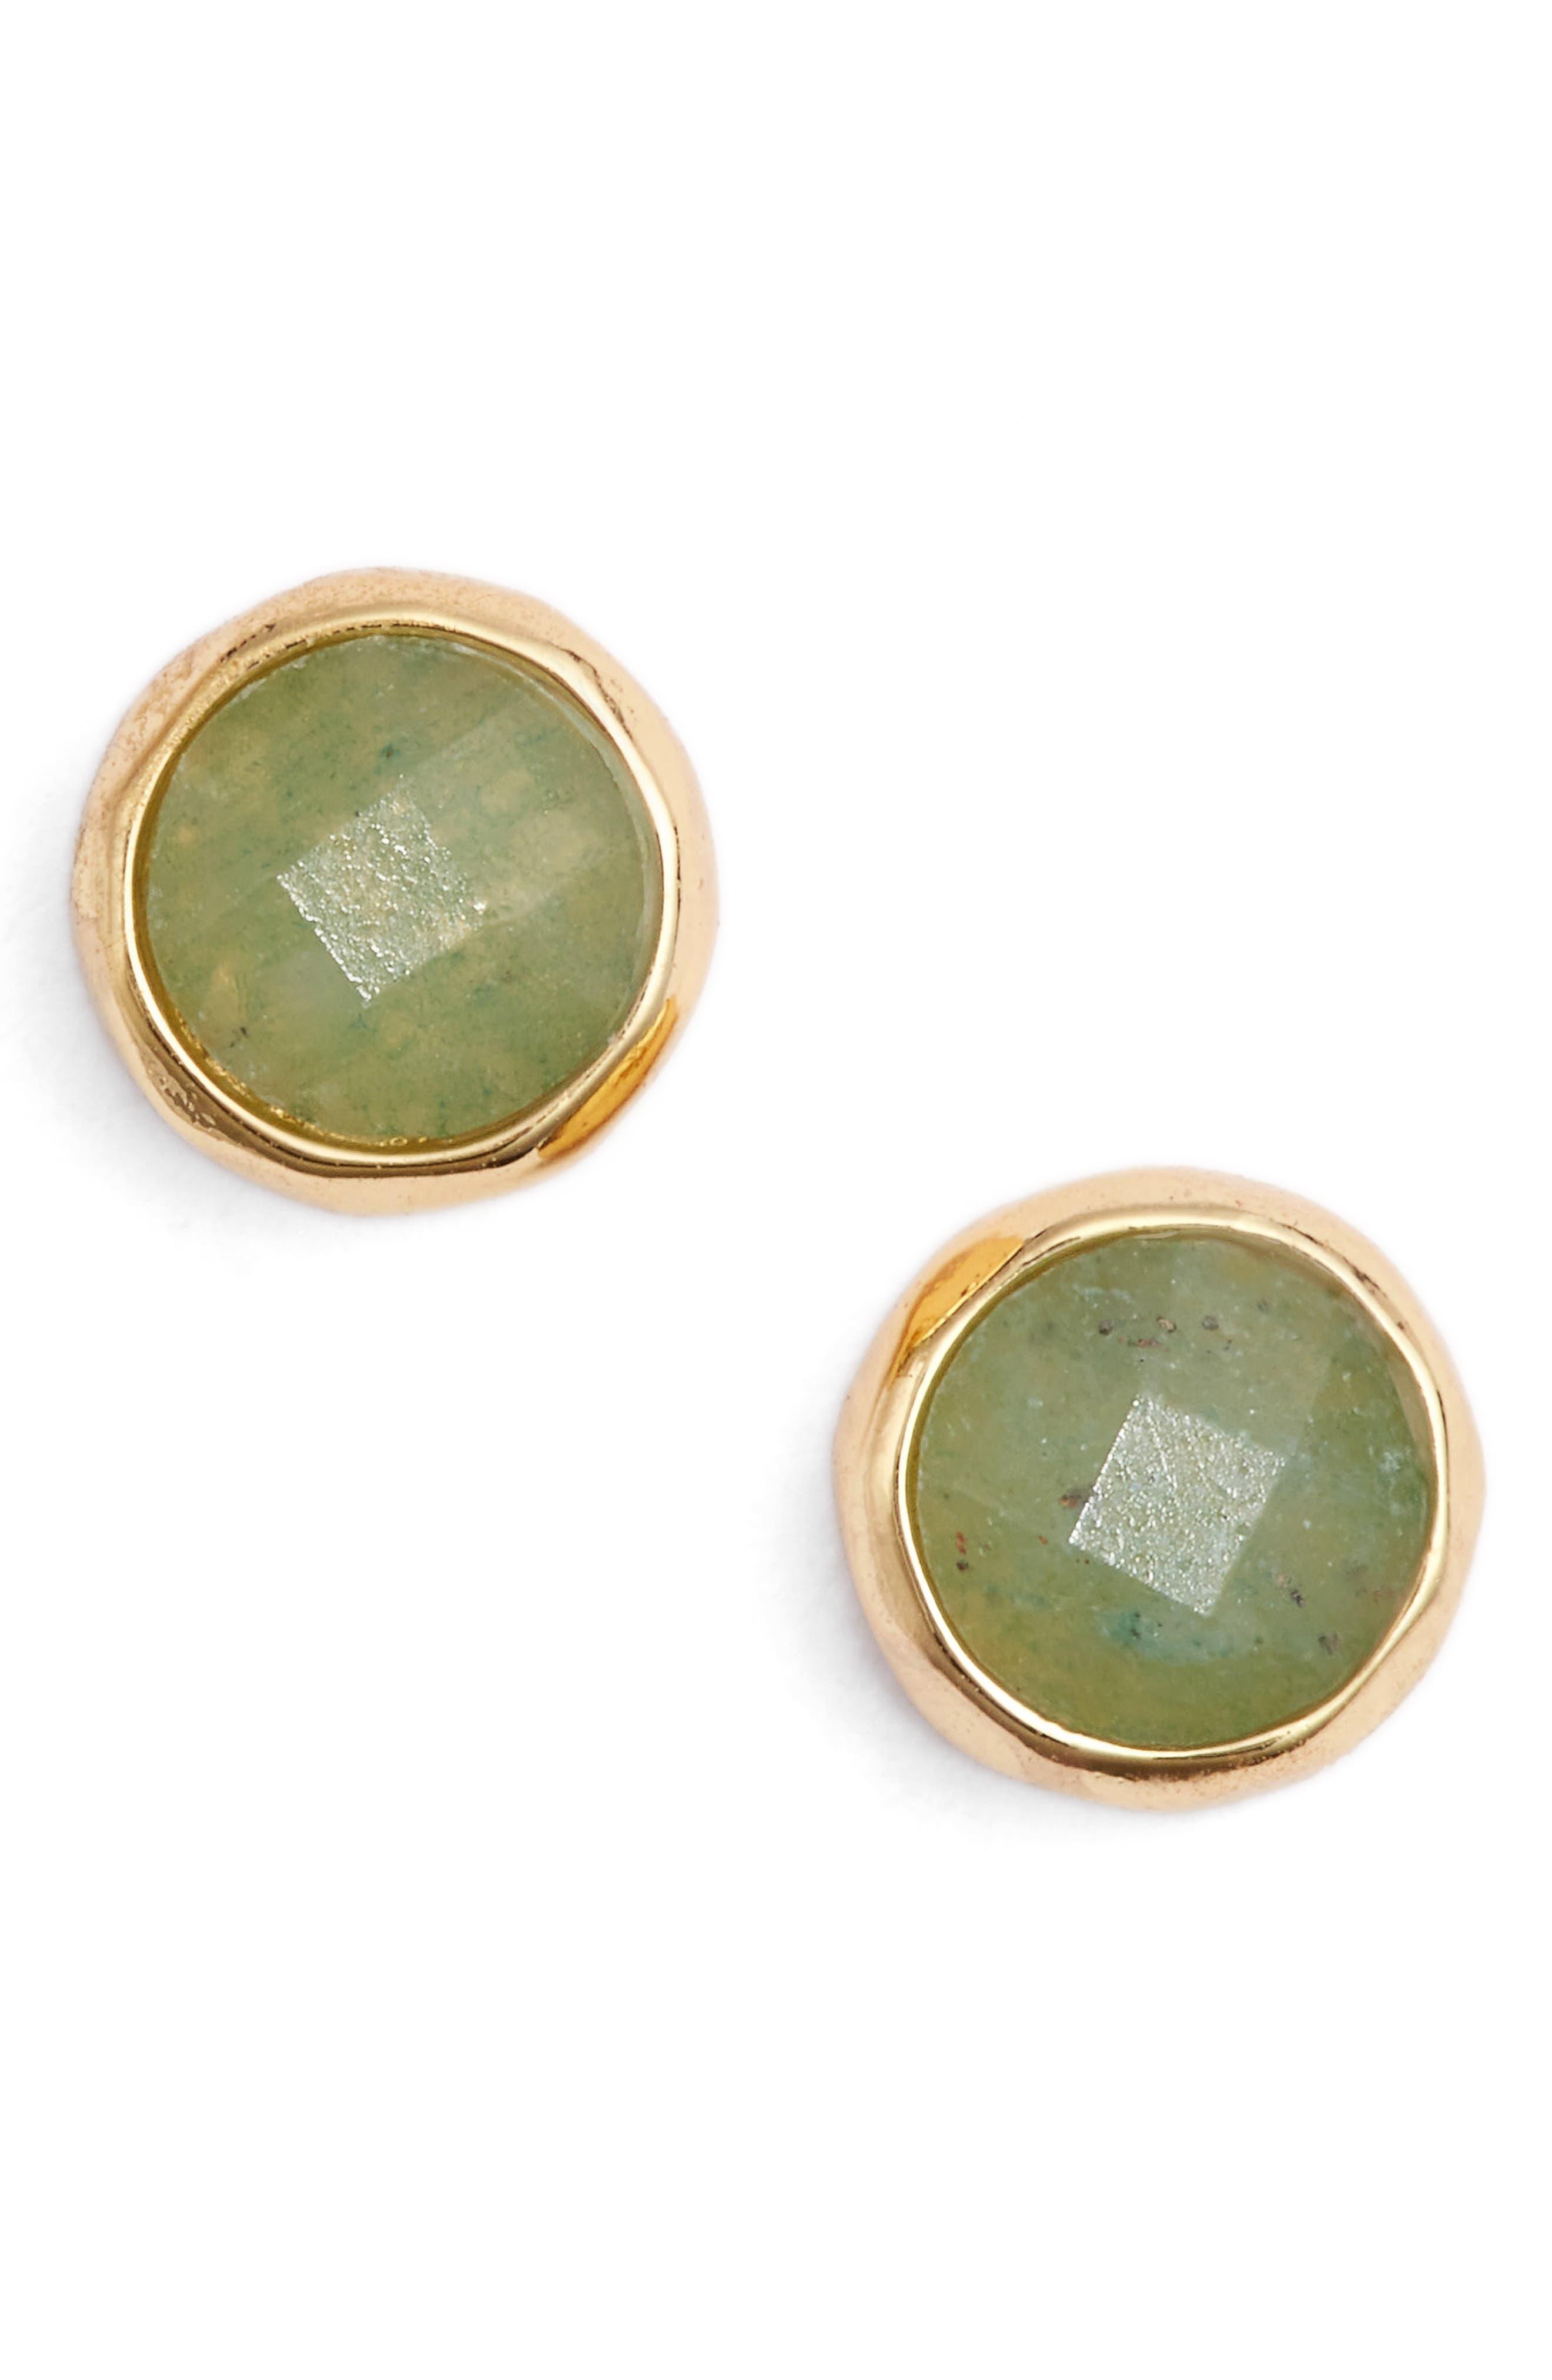 Aventurine Luck Stud Earrings,                         Main,                         color, Aventurine/ Gold